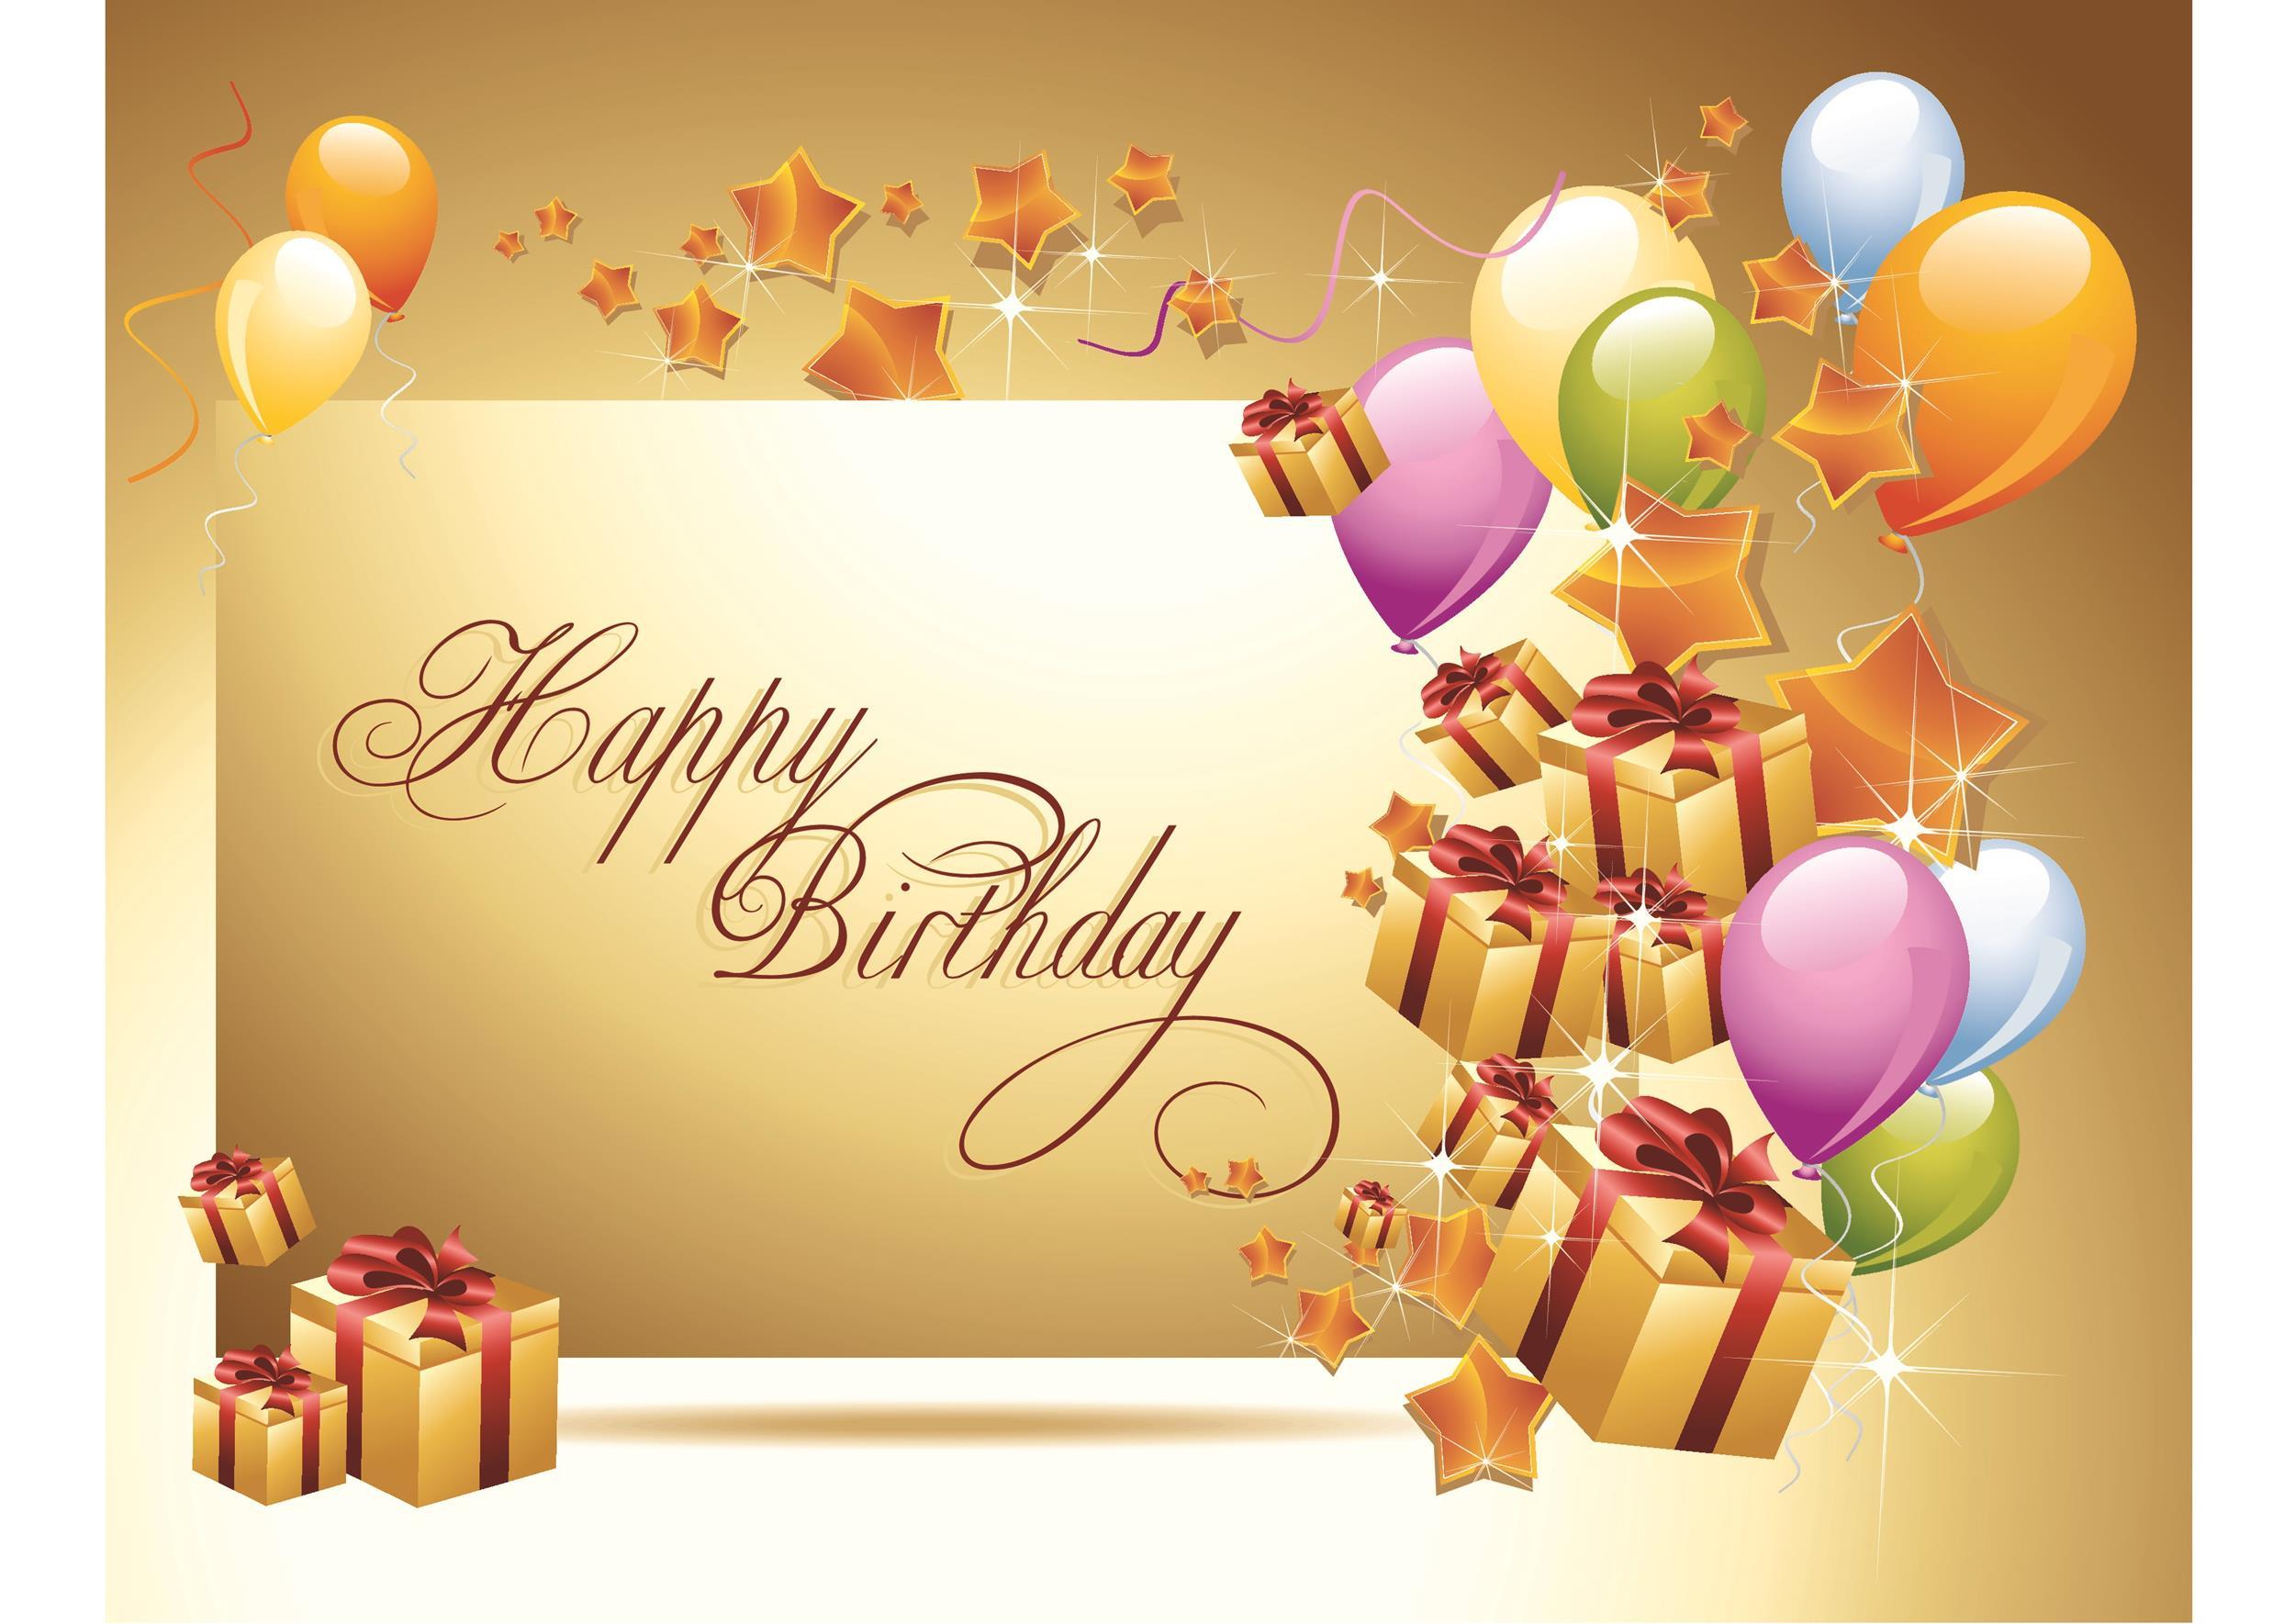 Free birthday card template 01